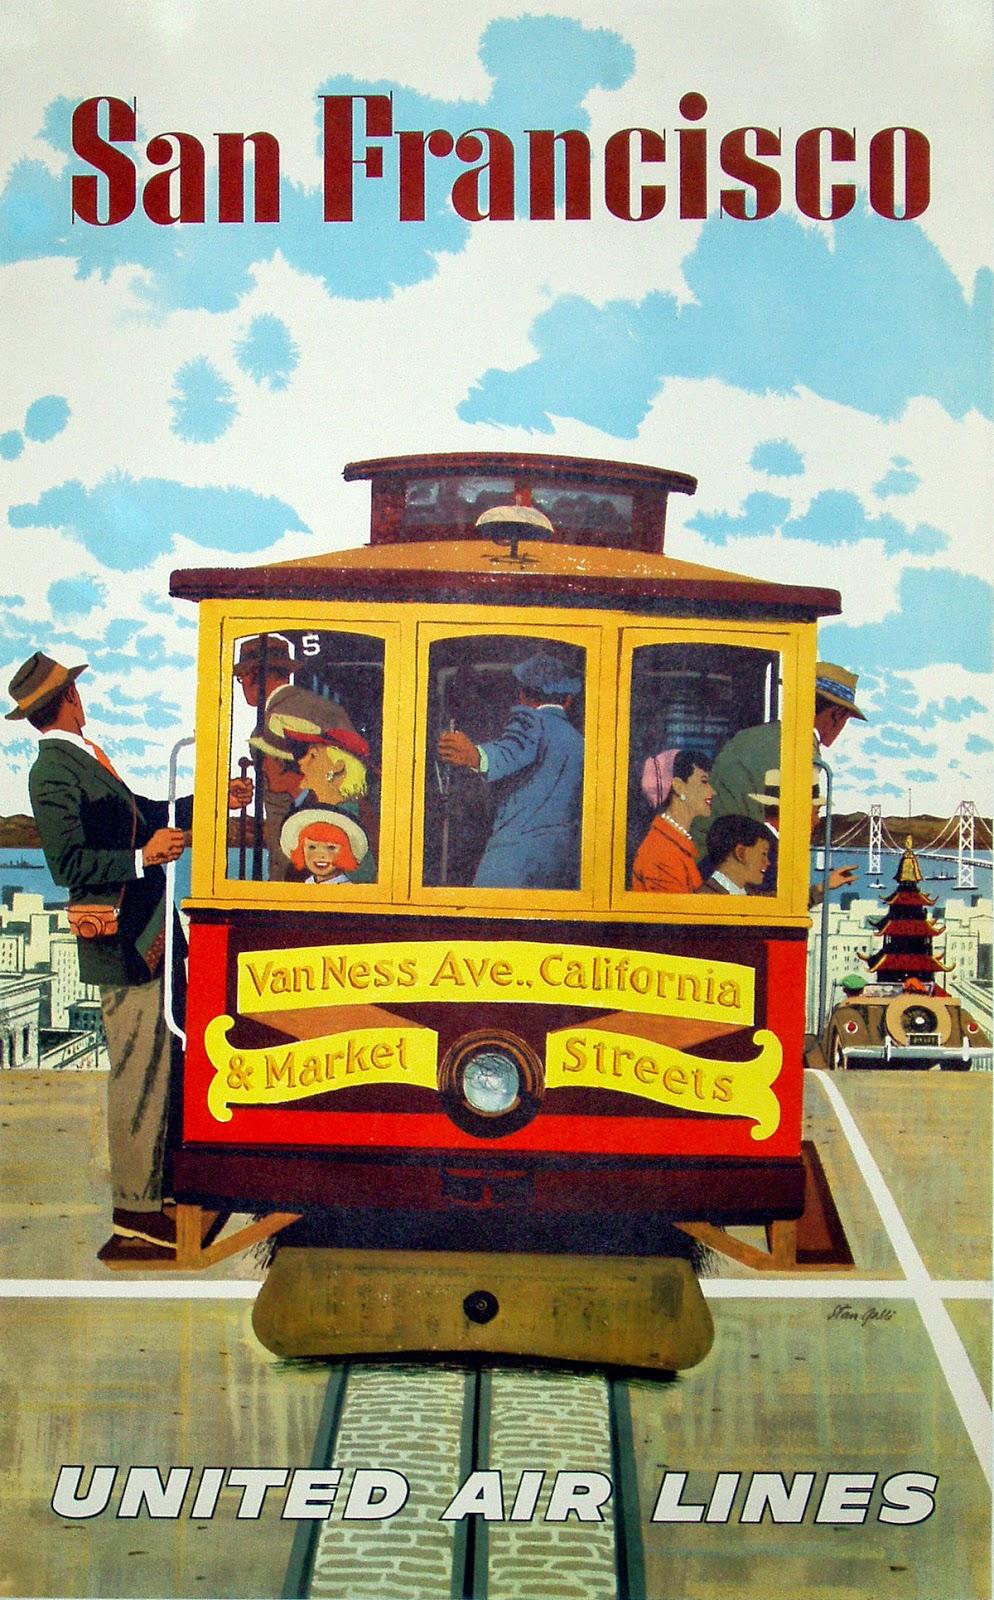 ART & ARTISTS: Vintage Travel Posters - part 5